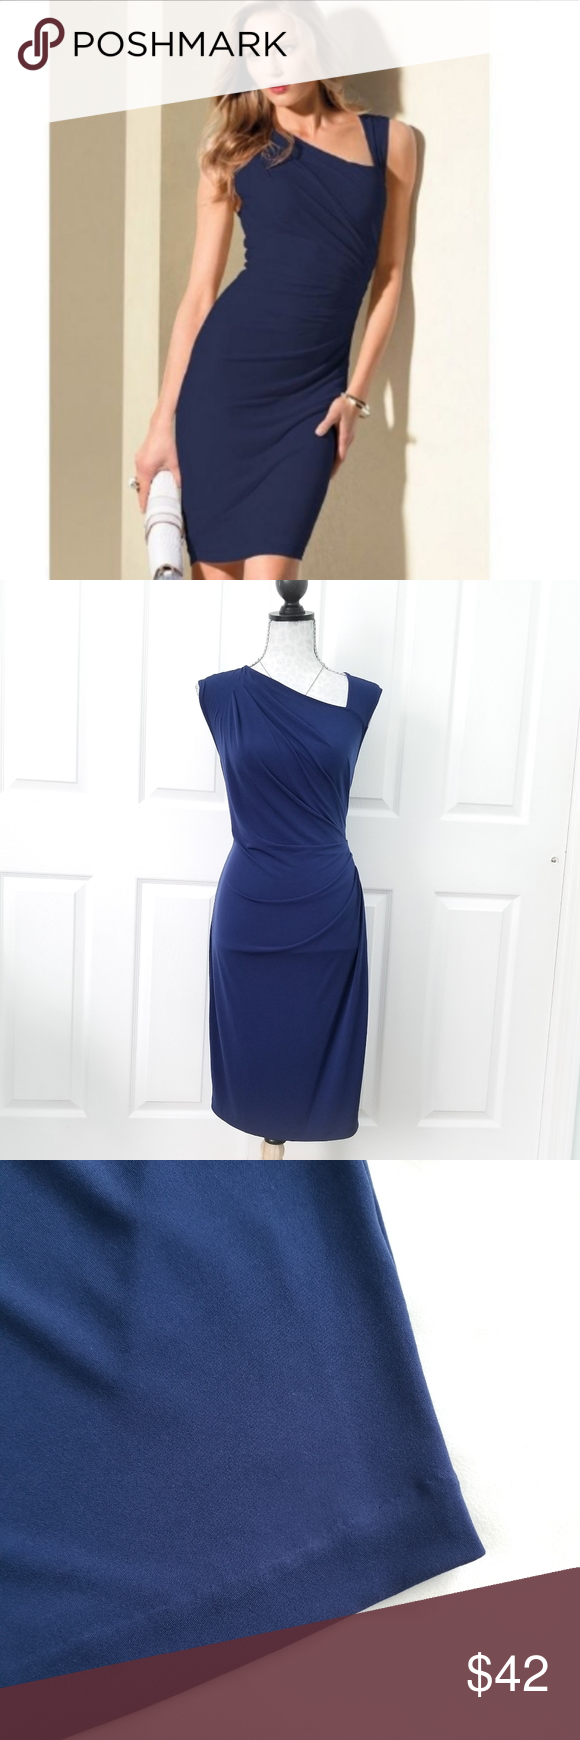 Victoria S Secret Asymmetrical Dress Victoria S Secret Asymmetrical Cocktail Dress In Navy Blue Gorgeously Flatt Asymmetrical Dress Flattering Dresses Dresses [ 1740 x 580 Pixel ]